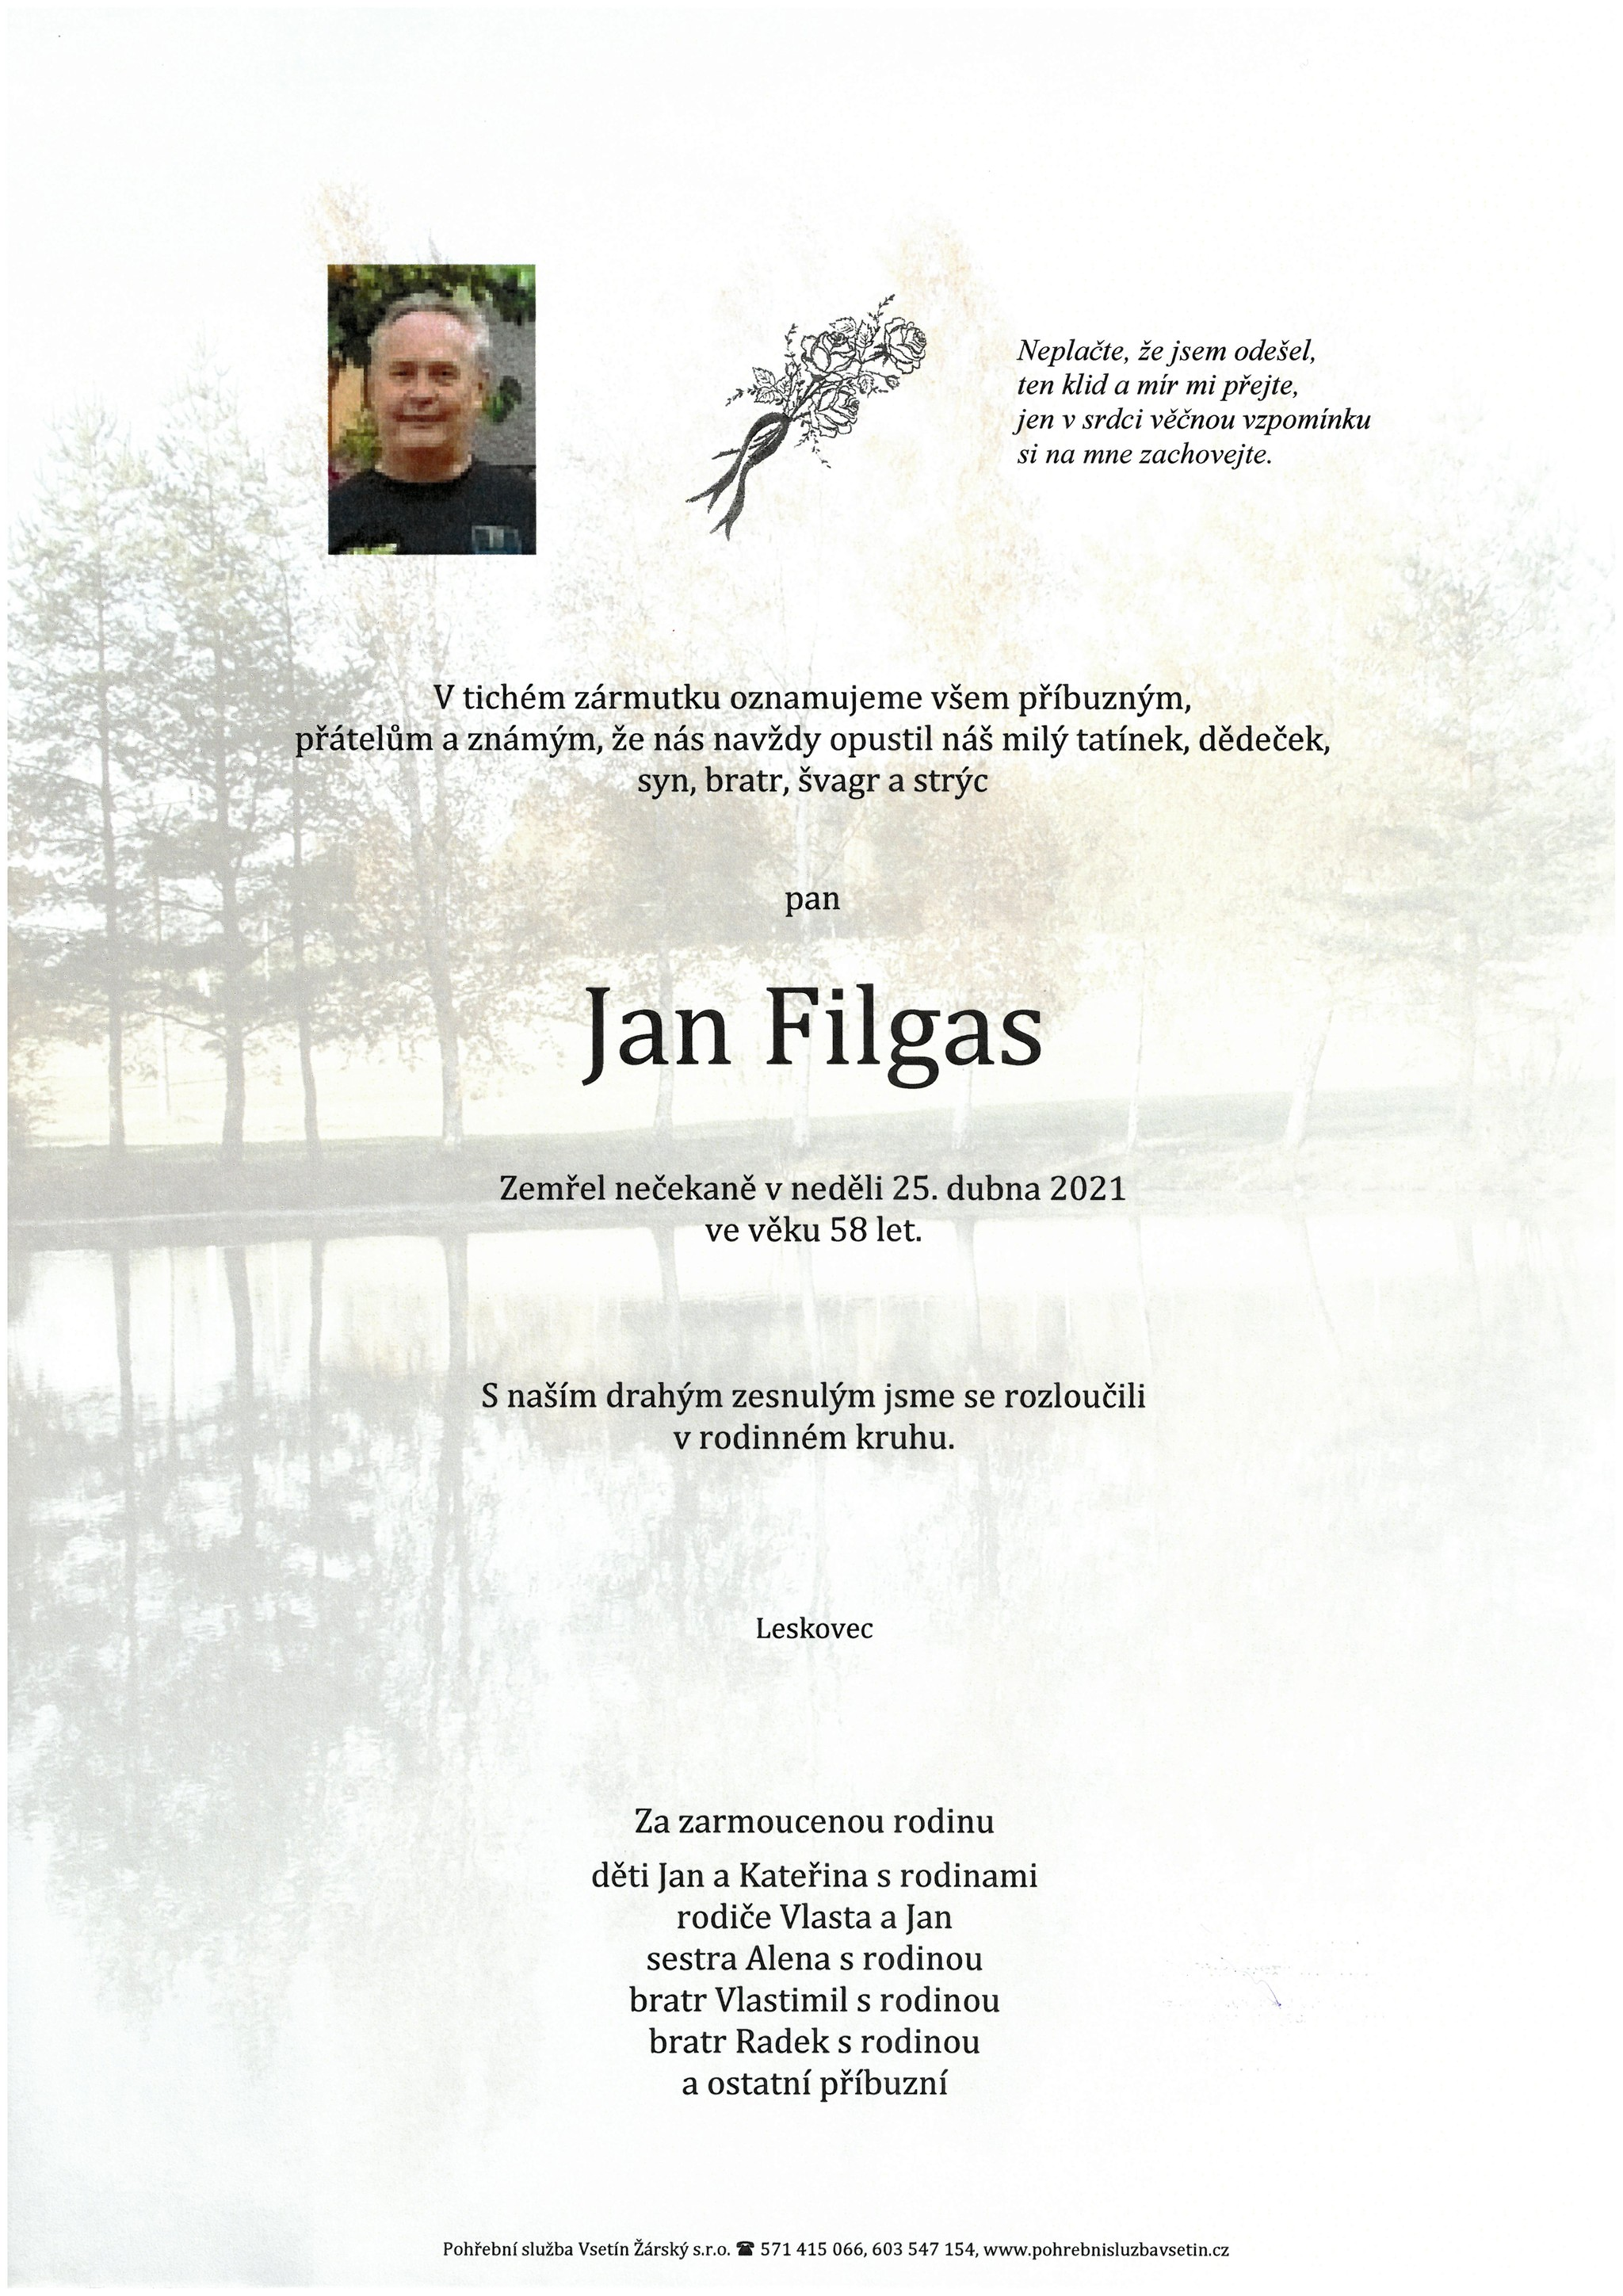 Jan Filgas